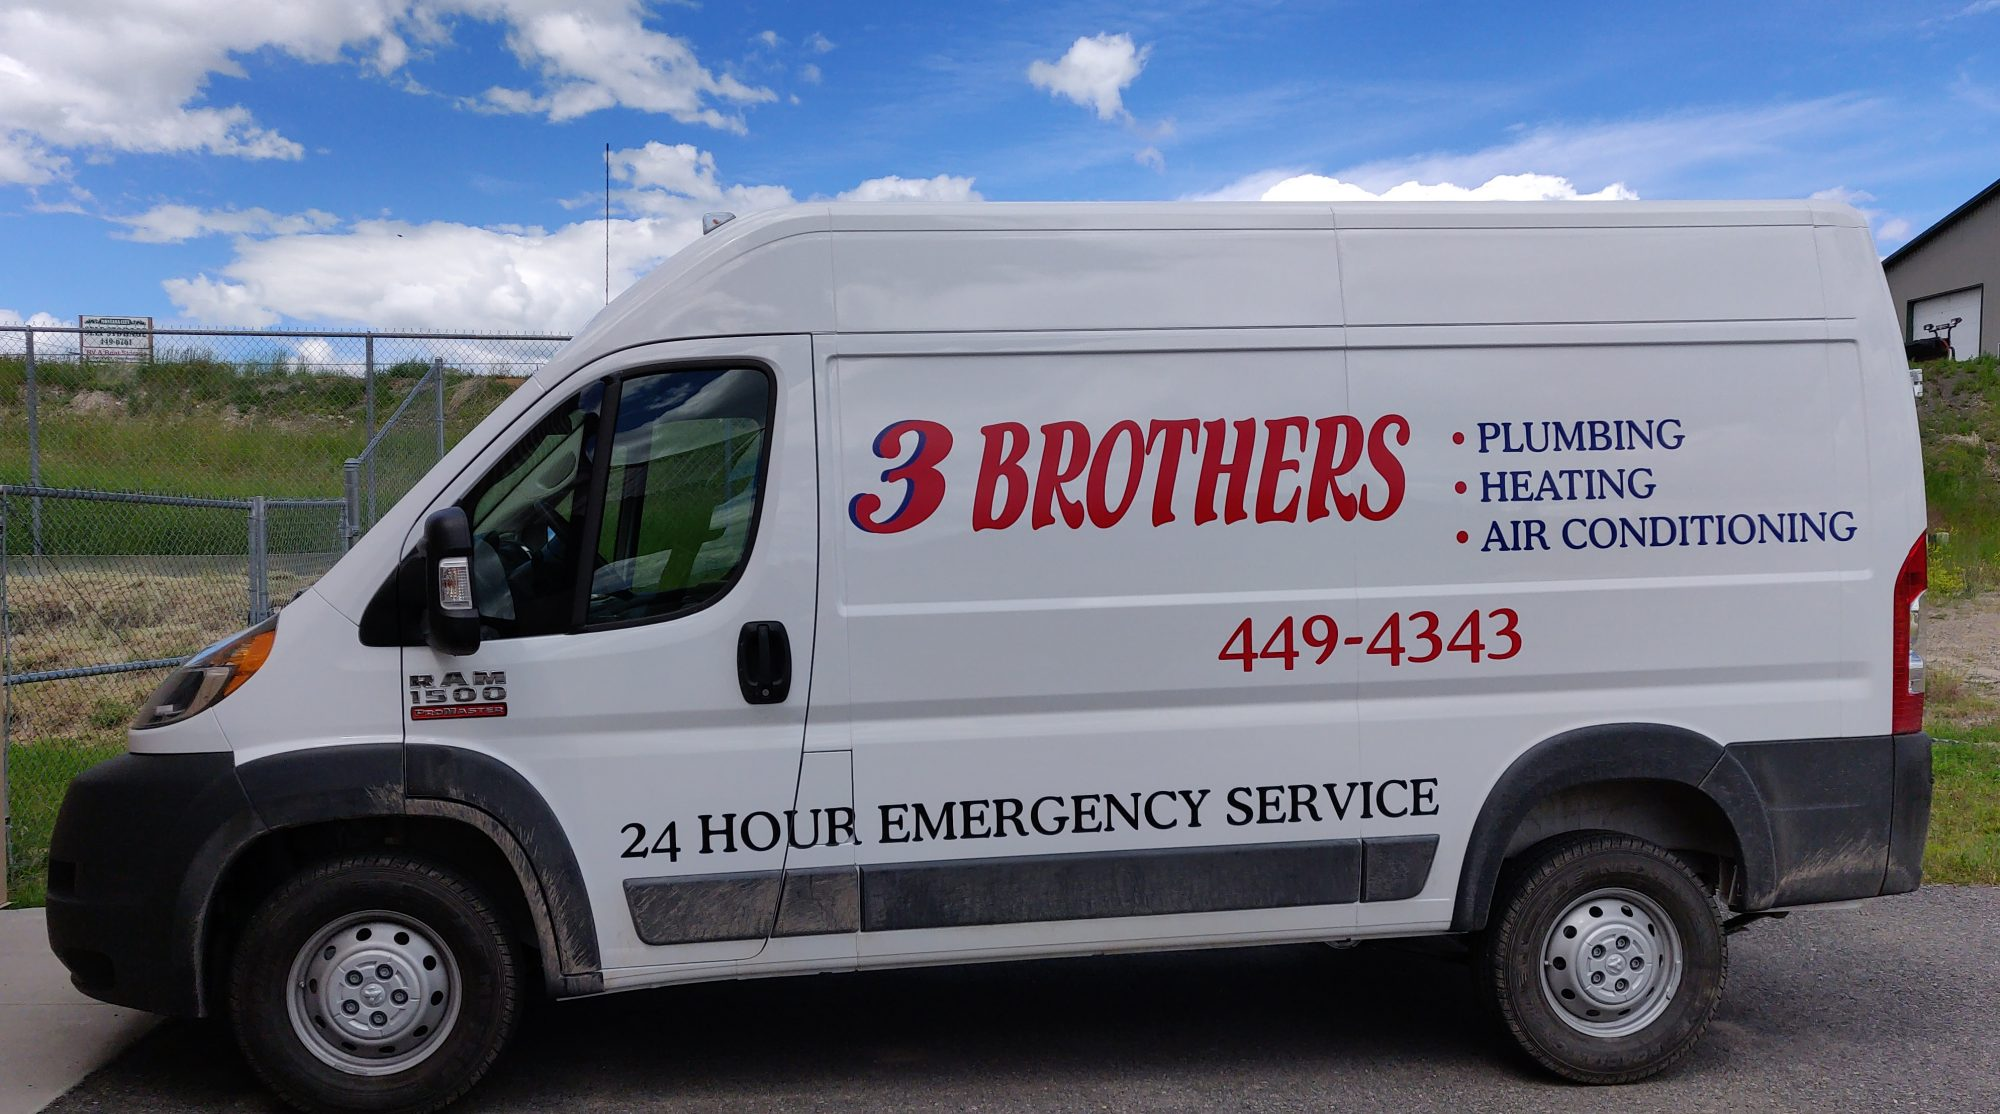 3 Brothers Plumbing & Heating